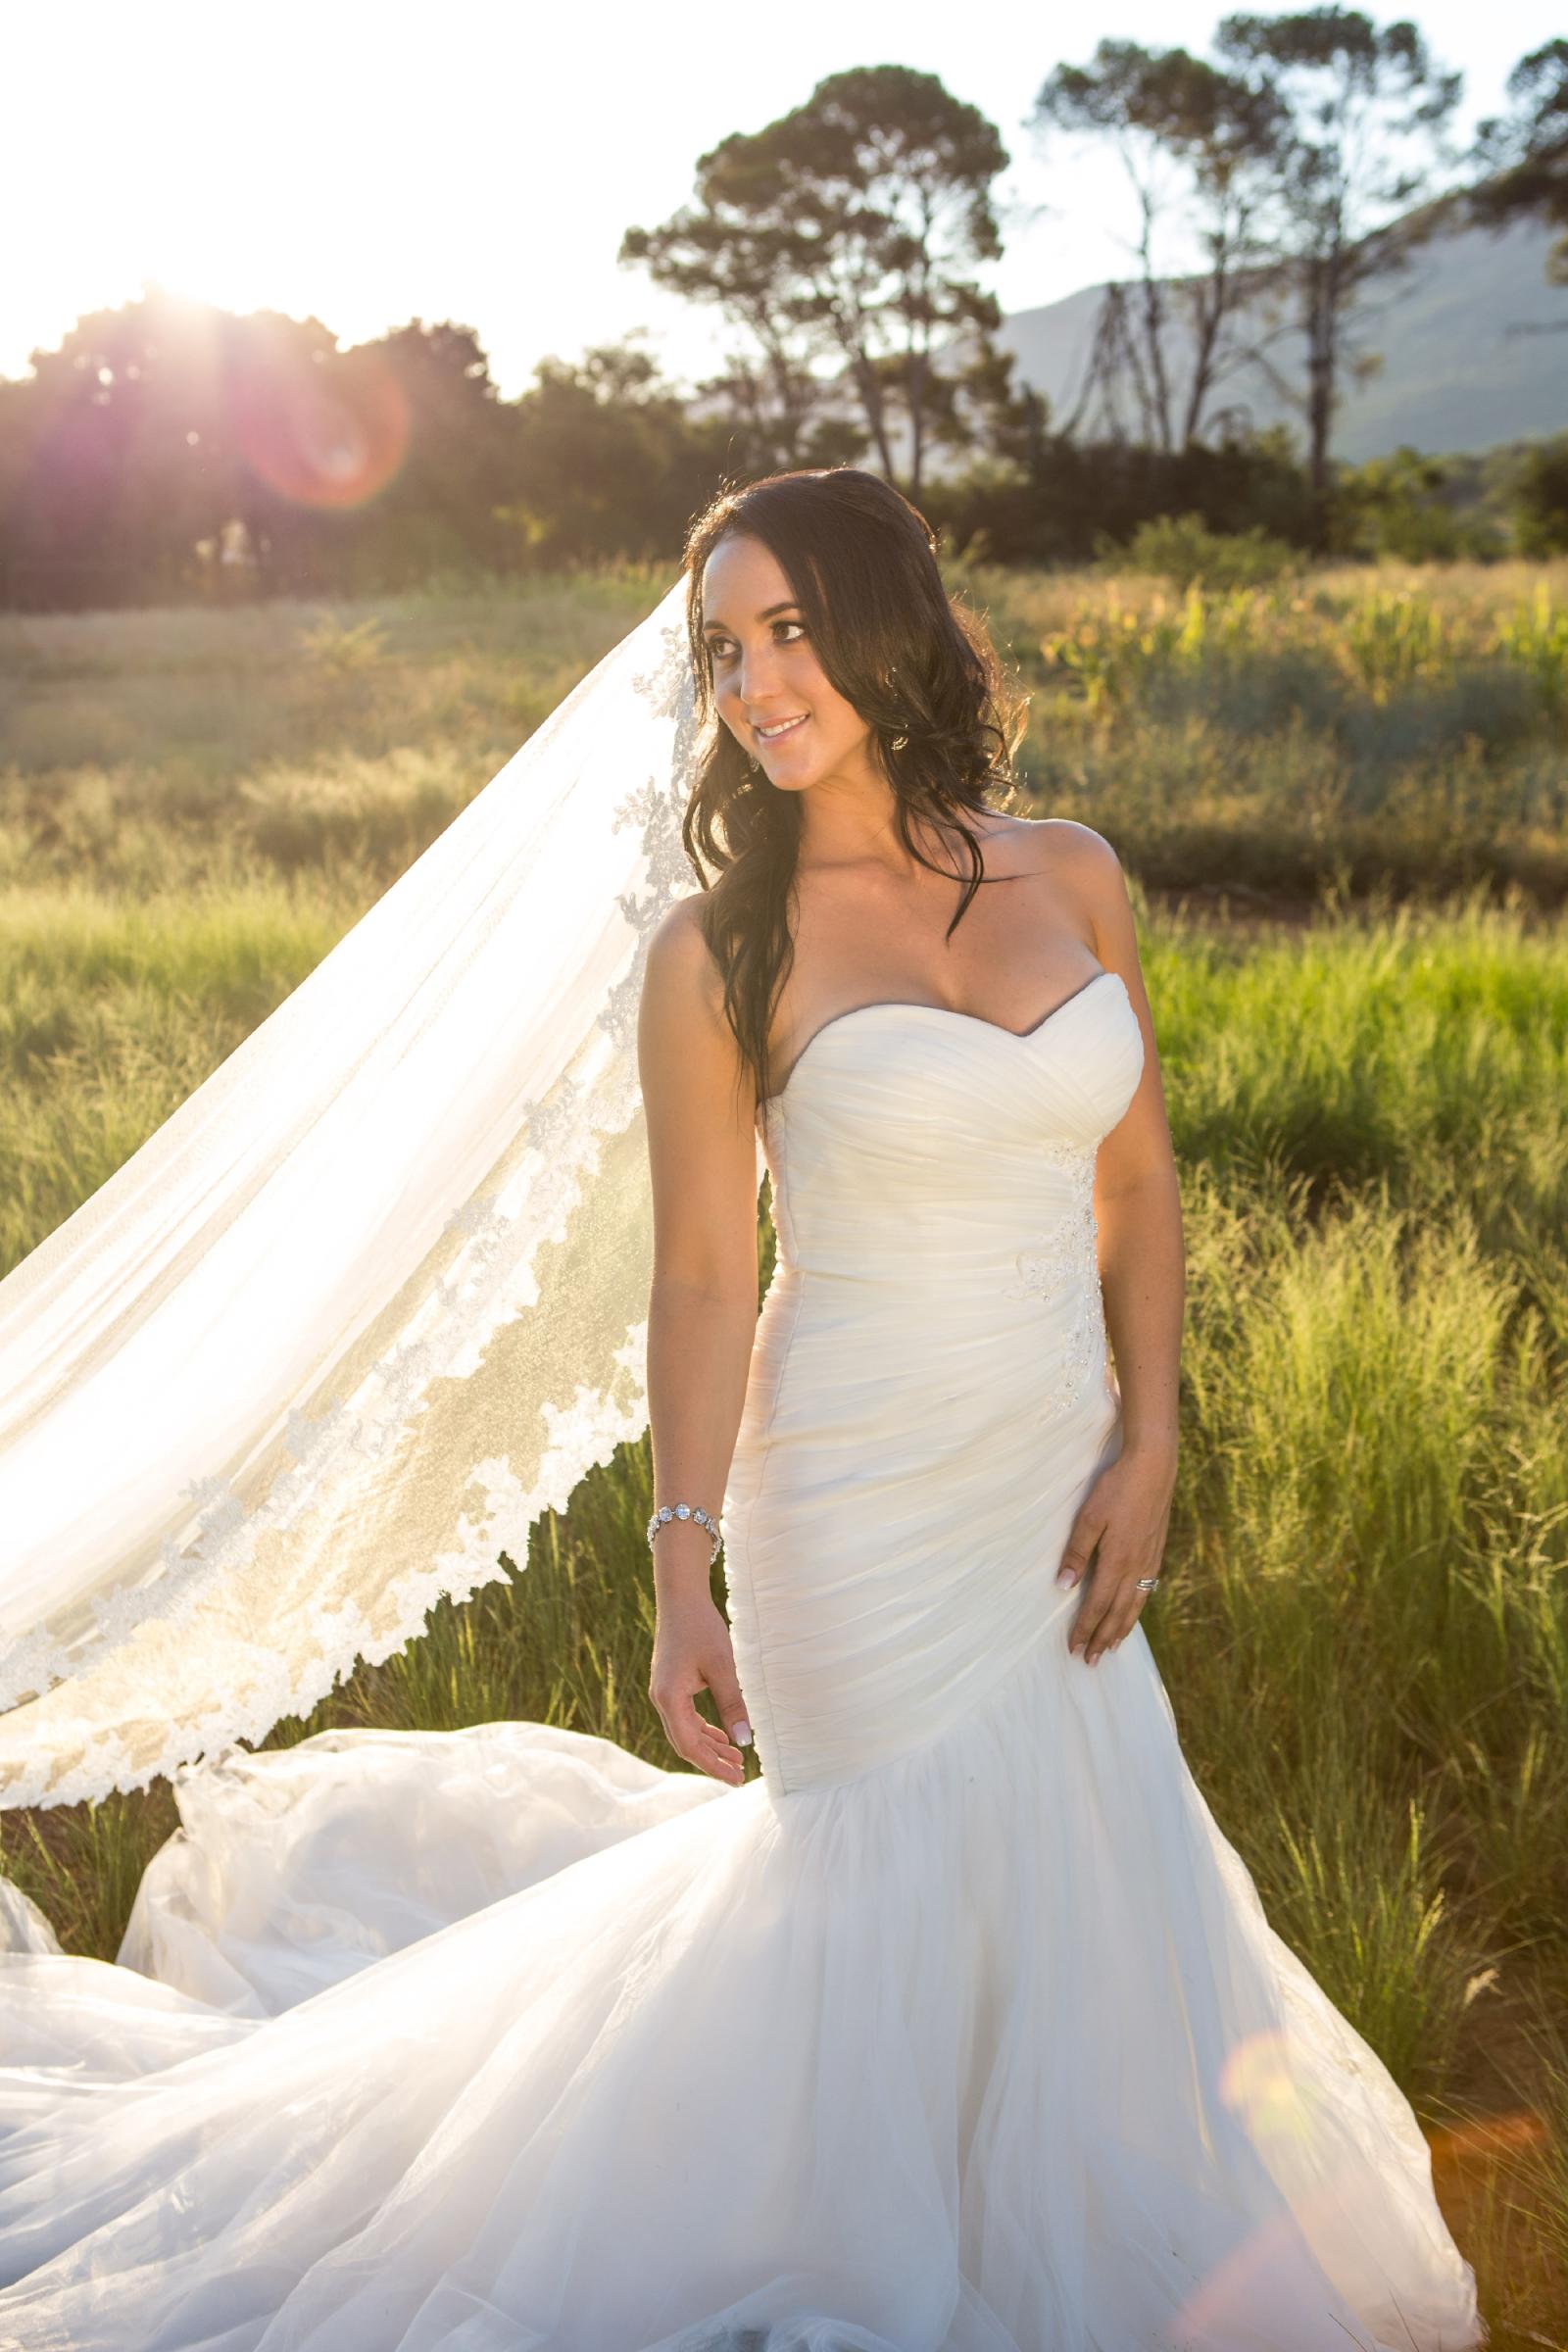 Second Hand Wedding Dresses San Diego Of Pronovias San Patrick Zine Second Hand Wedding Dress On